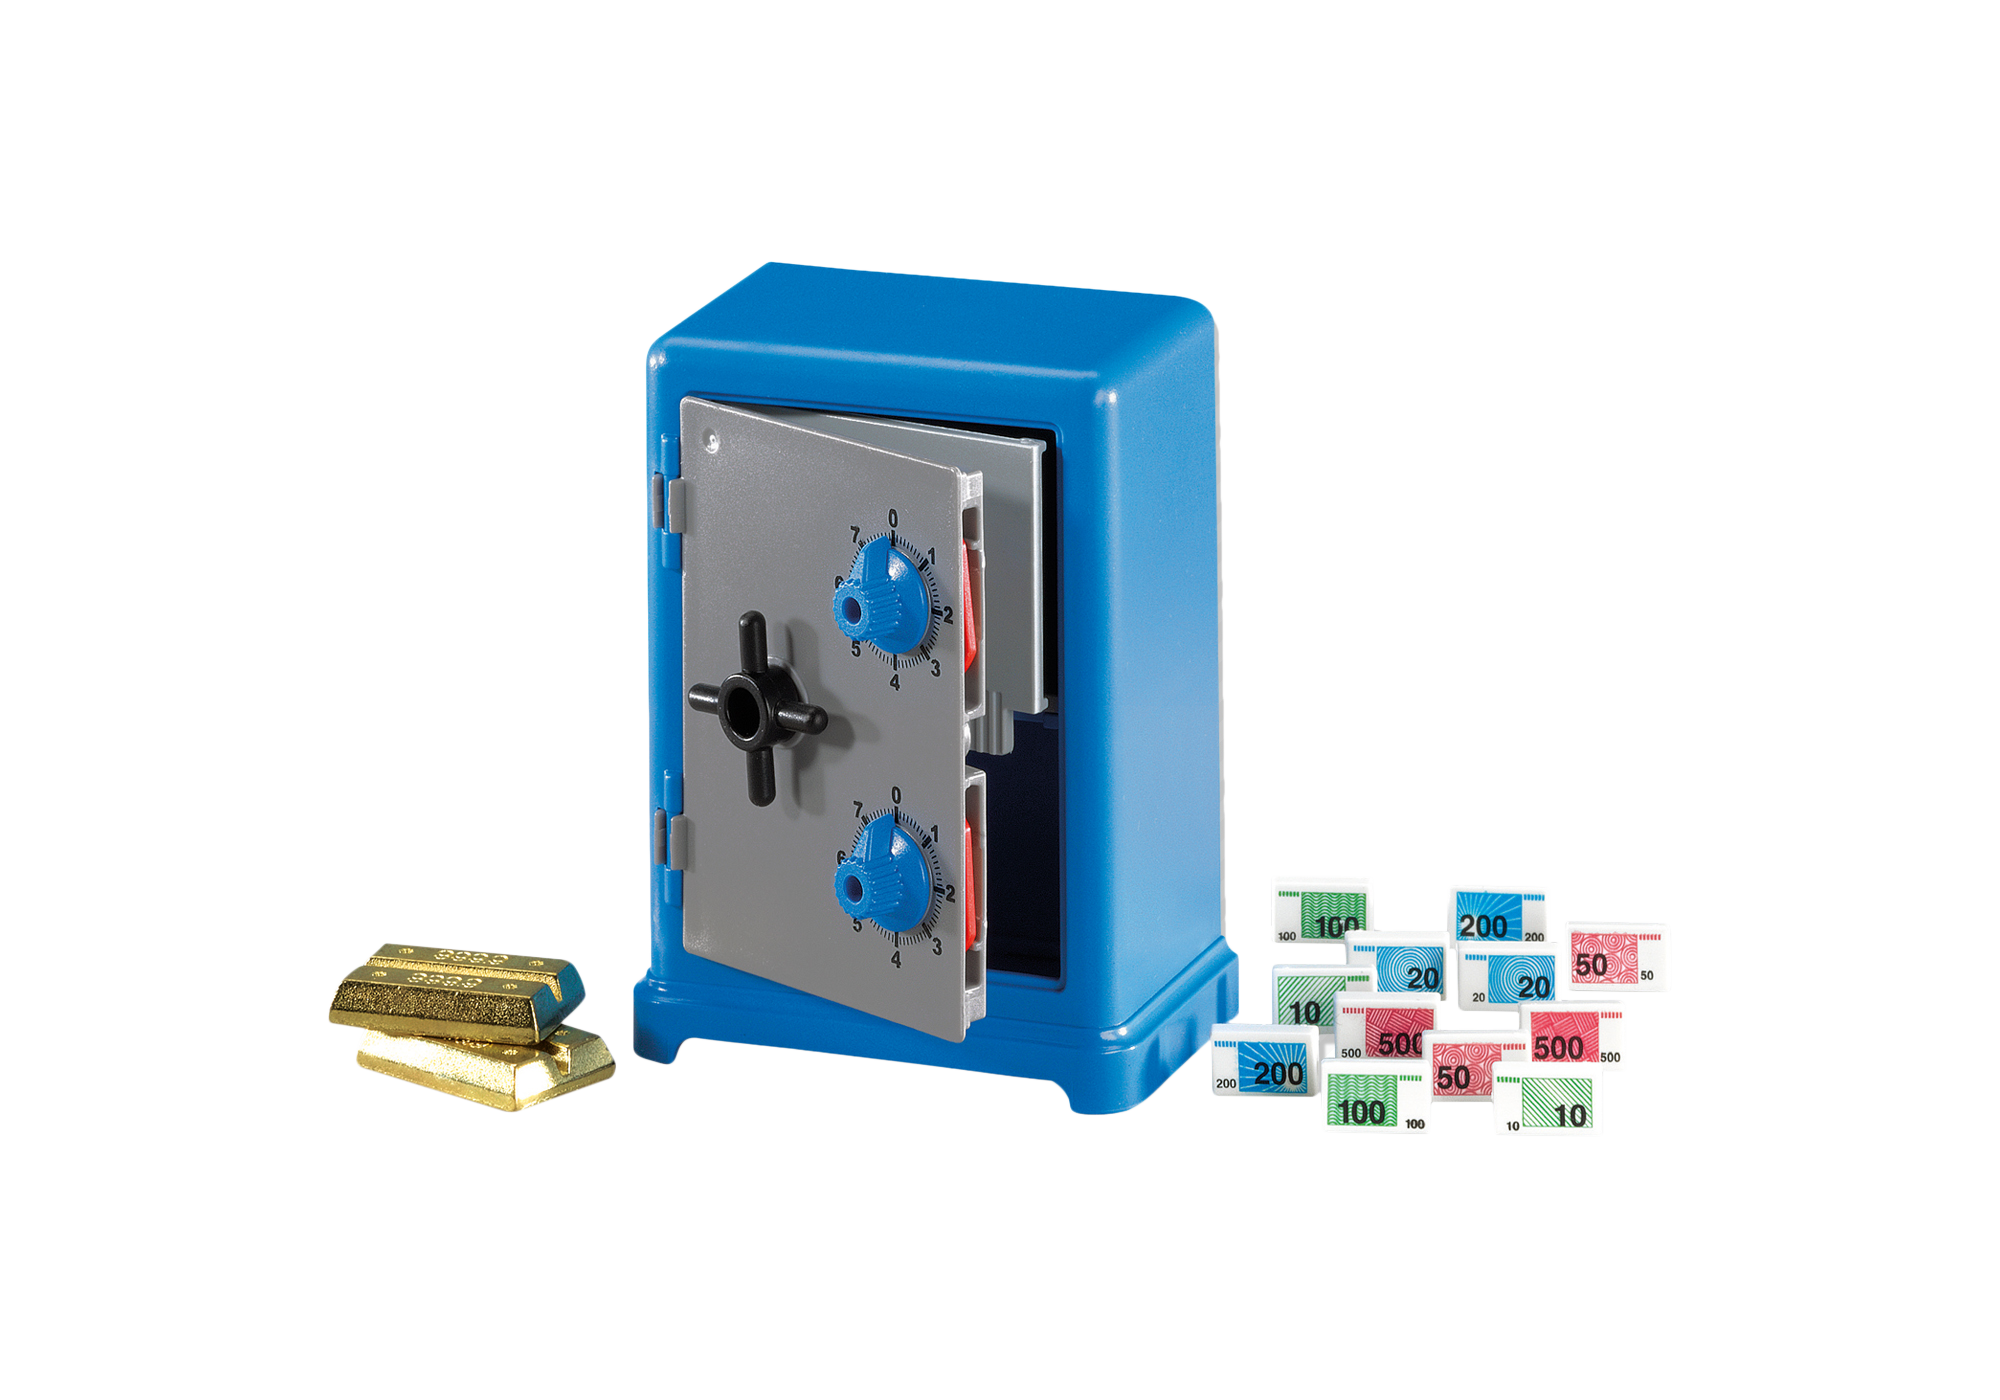 http://media.playmobil.com/i/playmobil/7446_product_detail/Coffre-fort